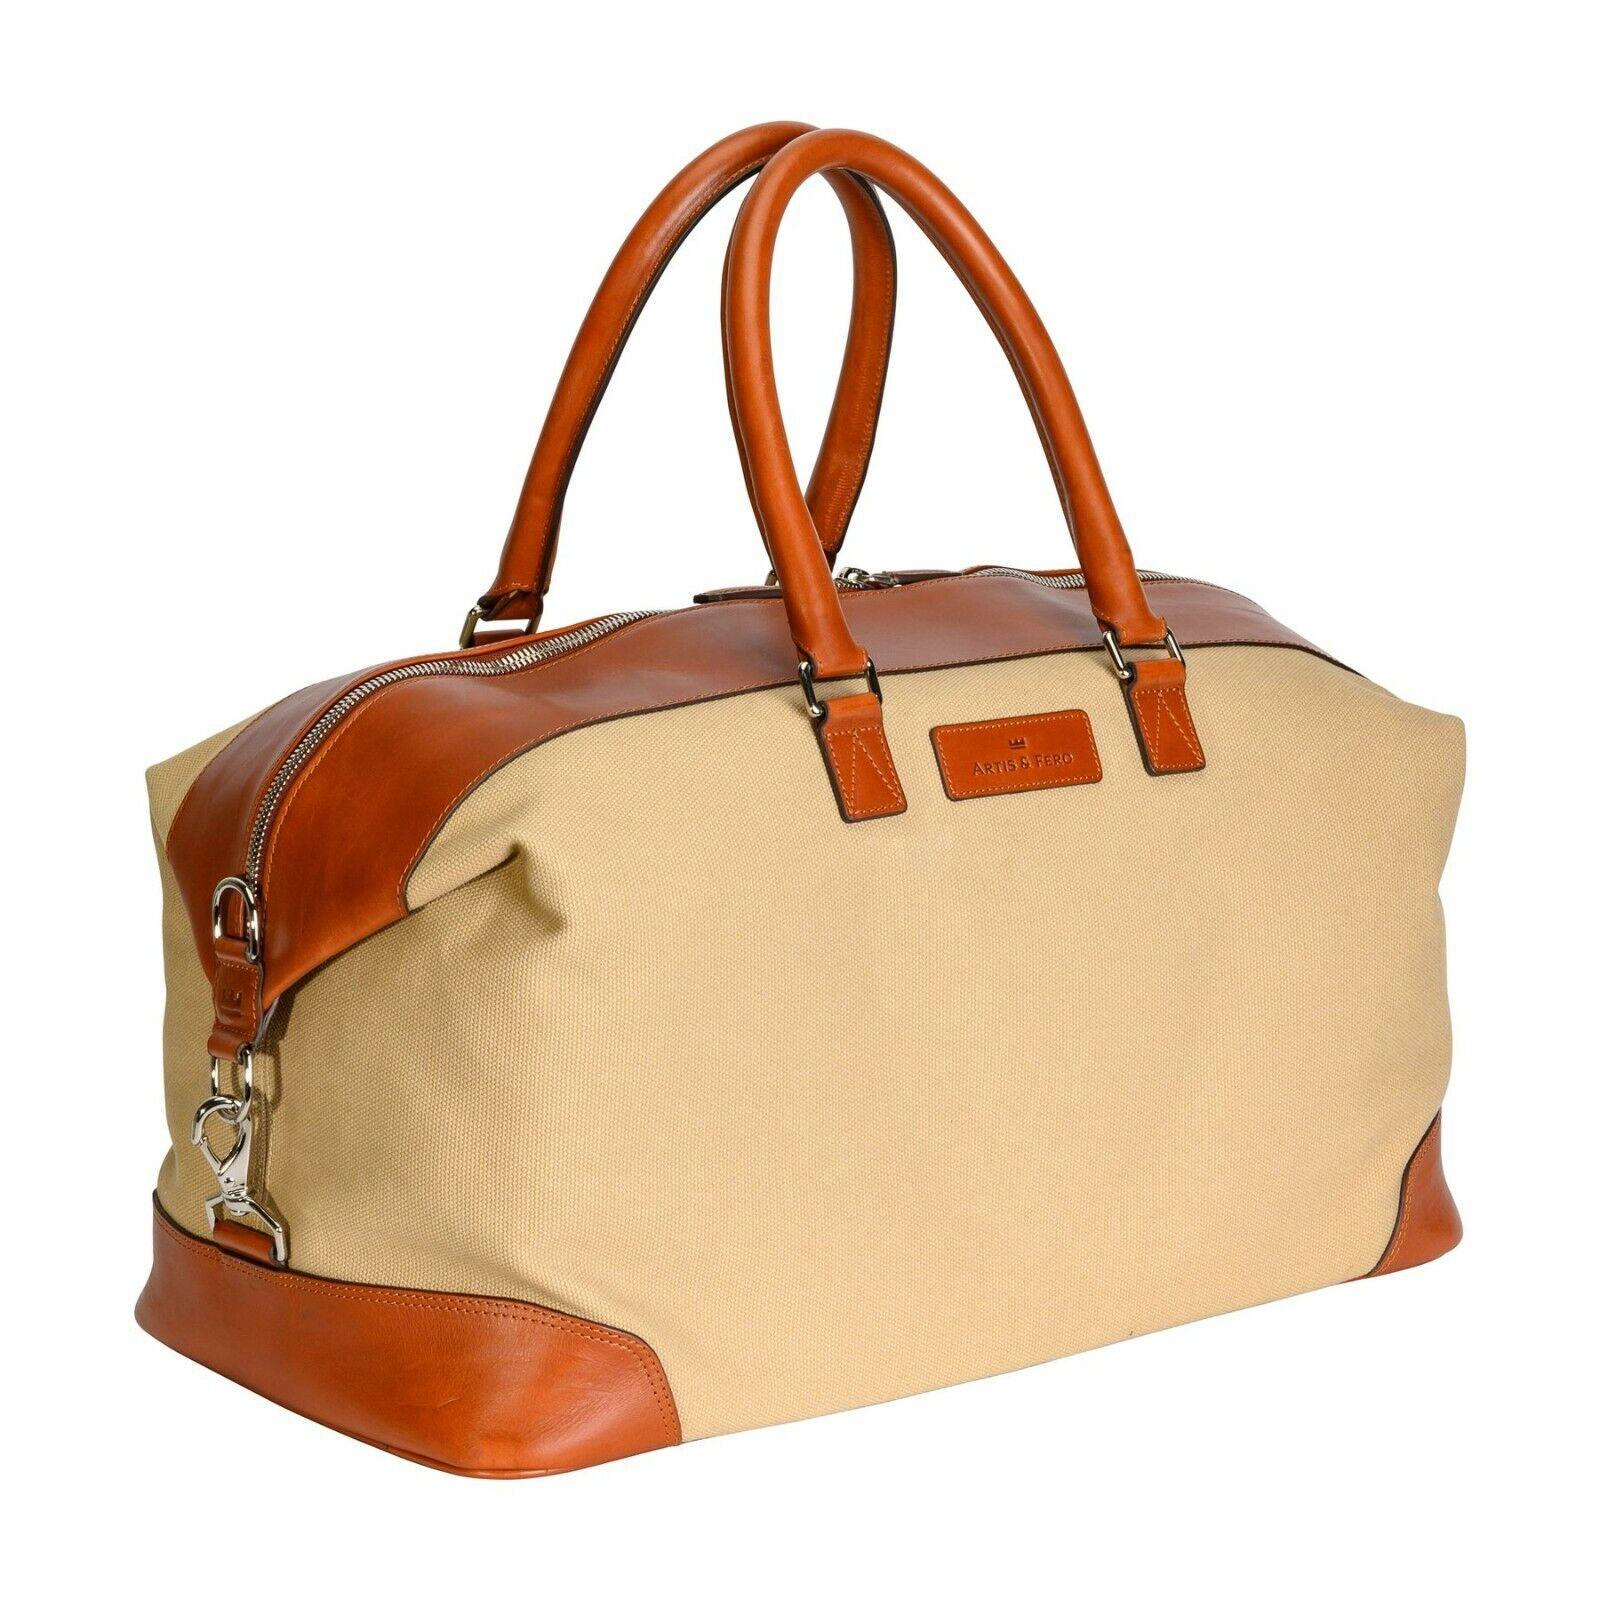 luggage Artis and Fero duffle